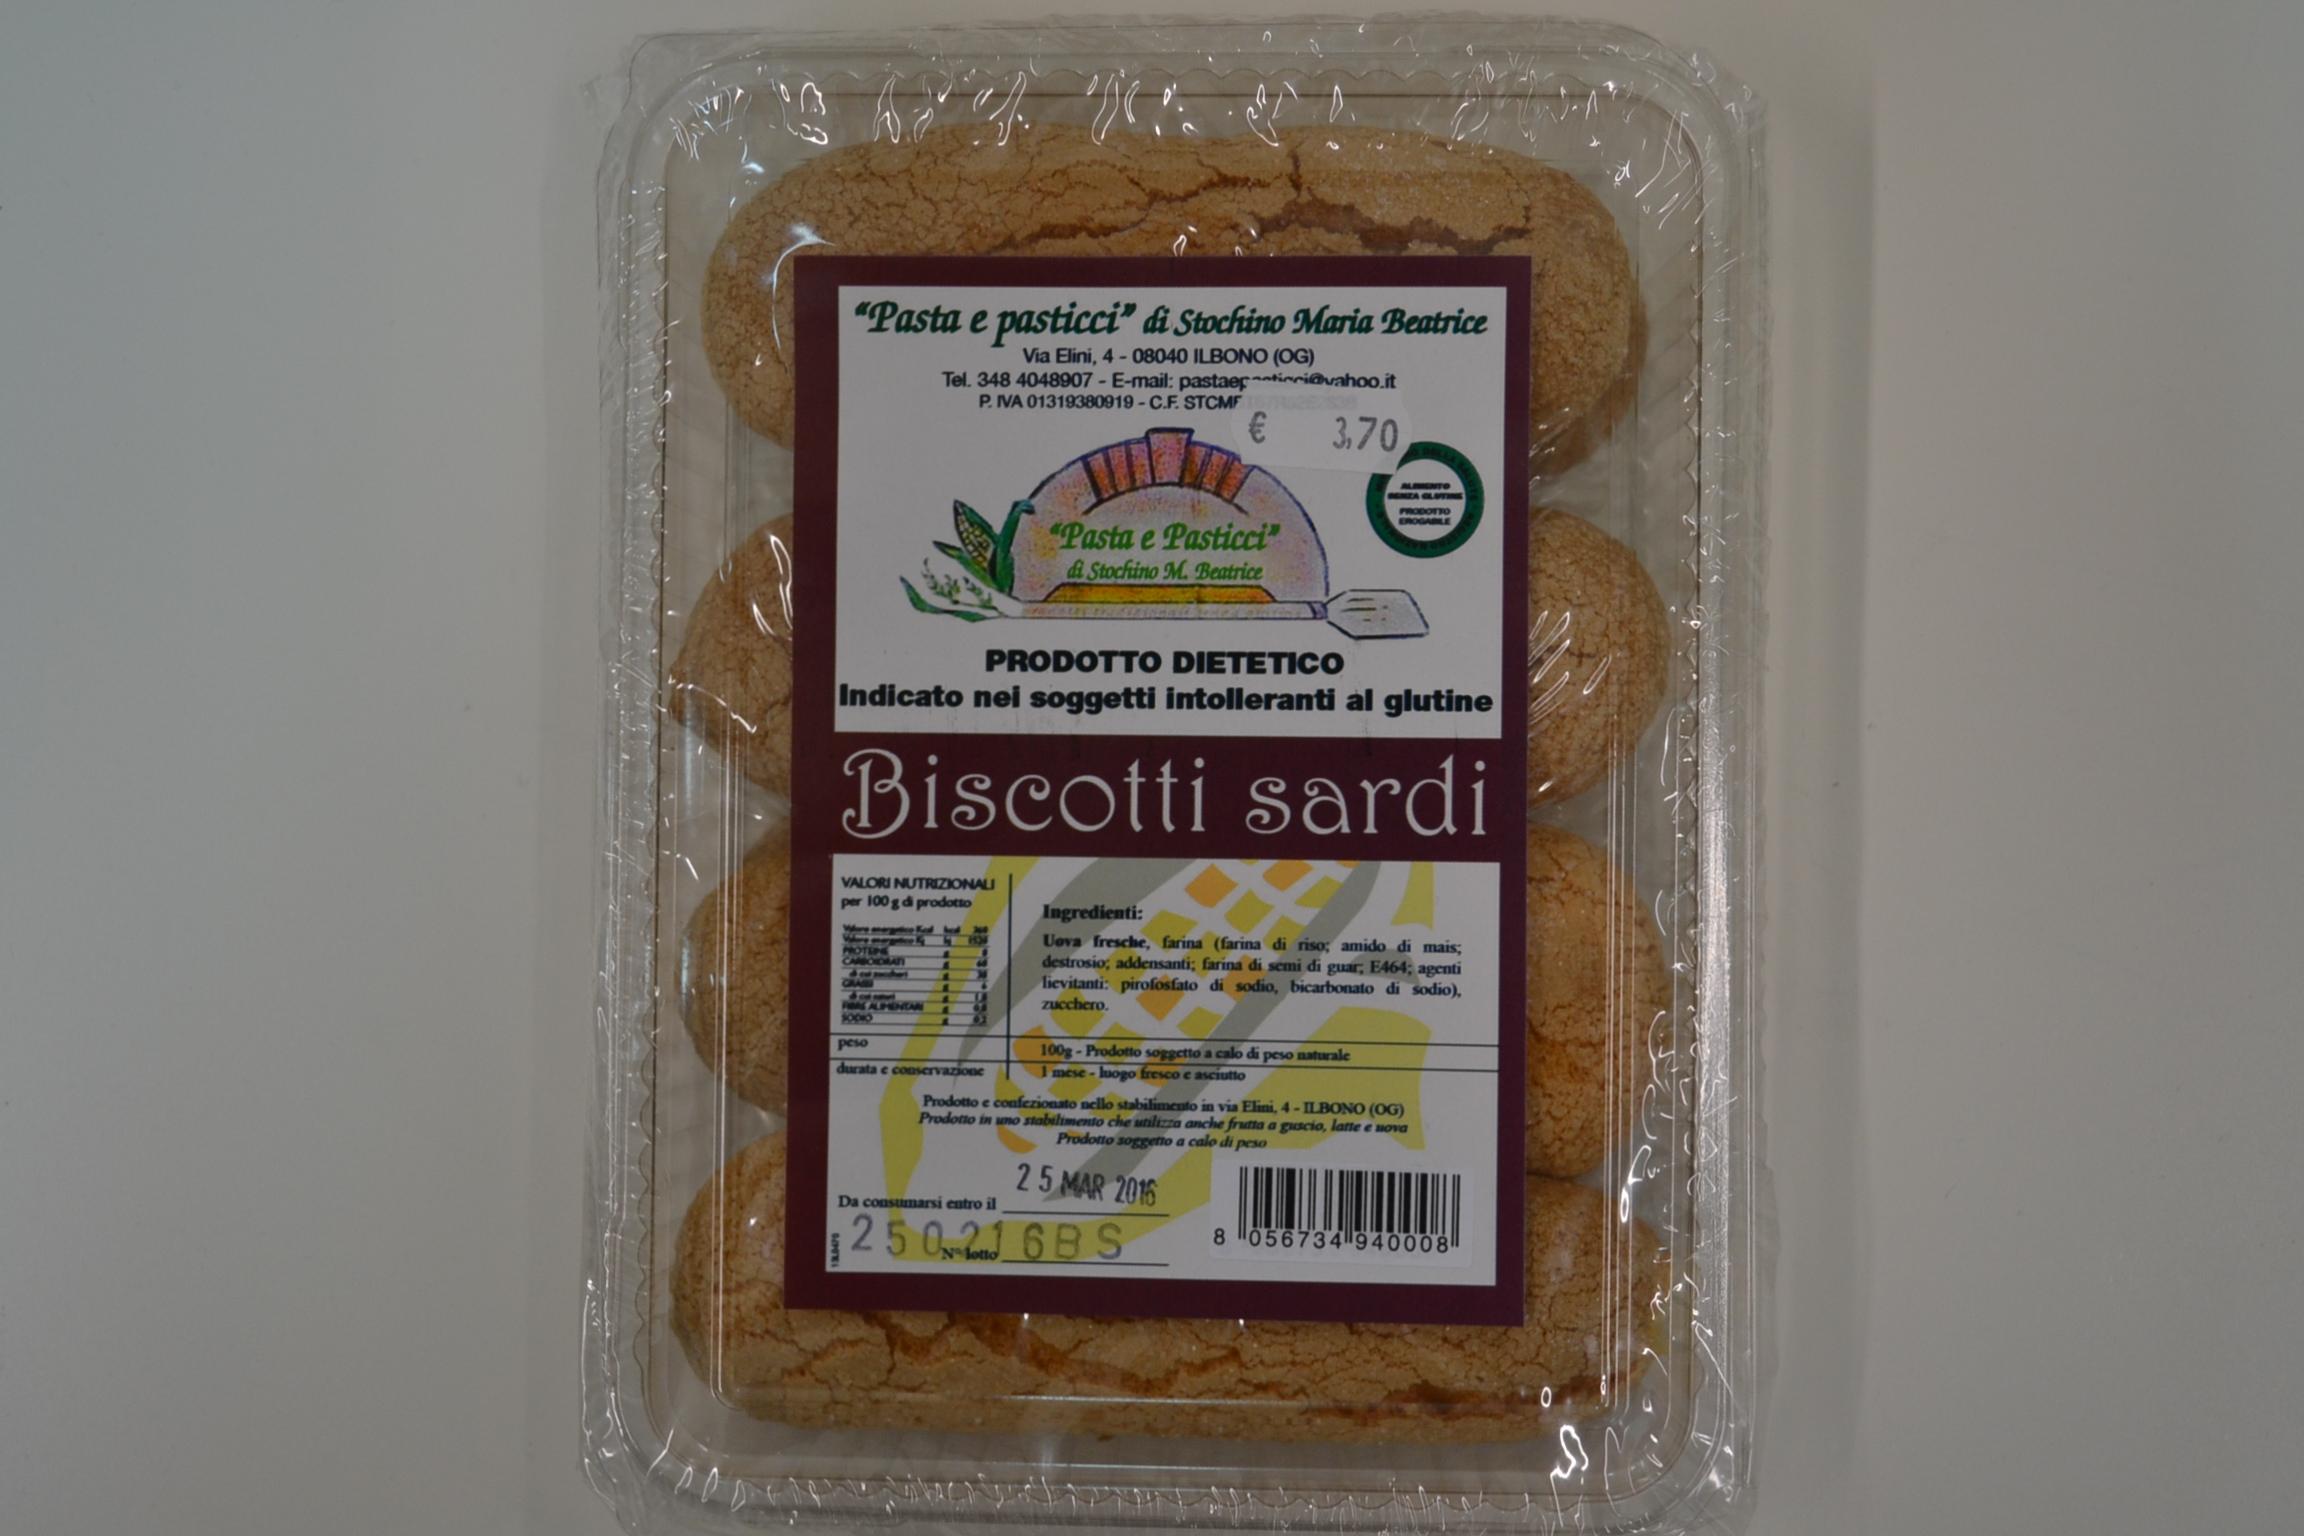 Biscotti sardi PASTA &PASTICCI